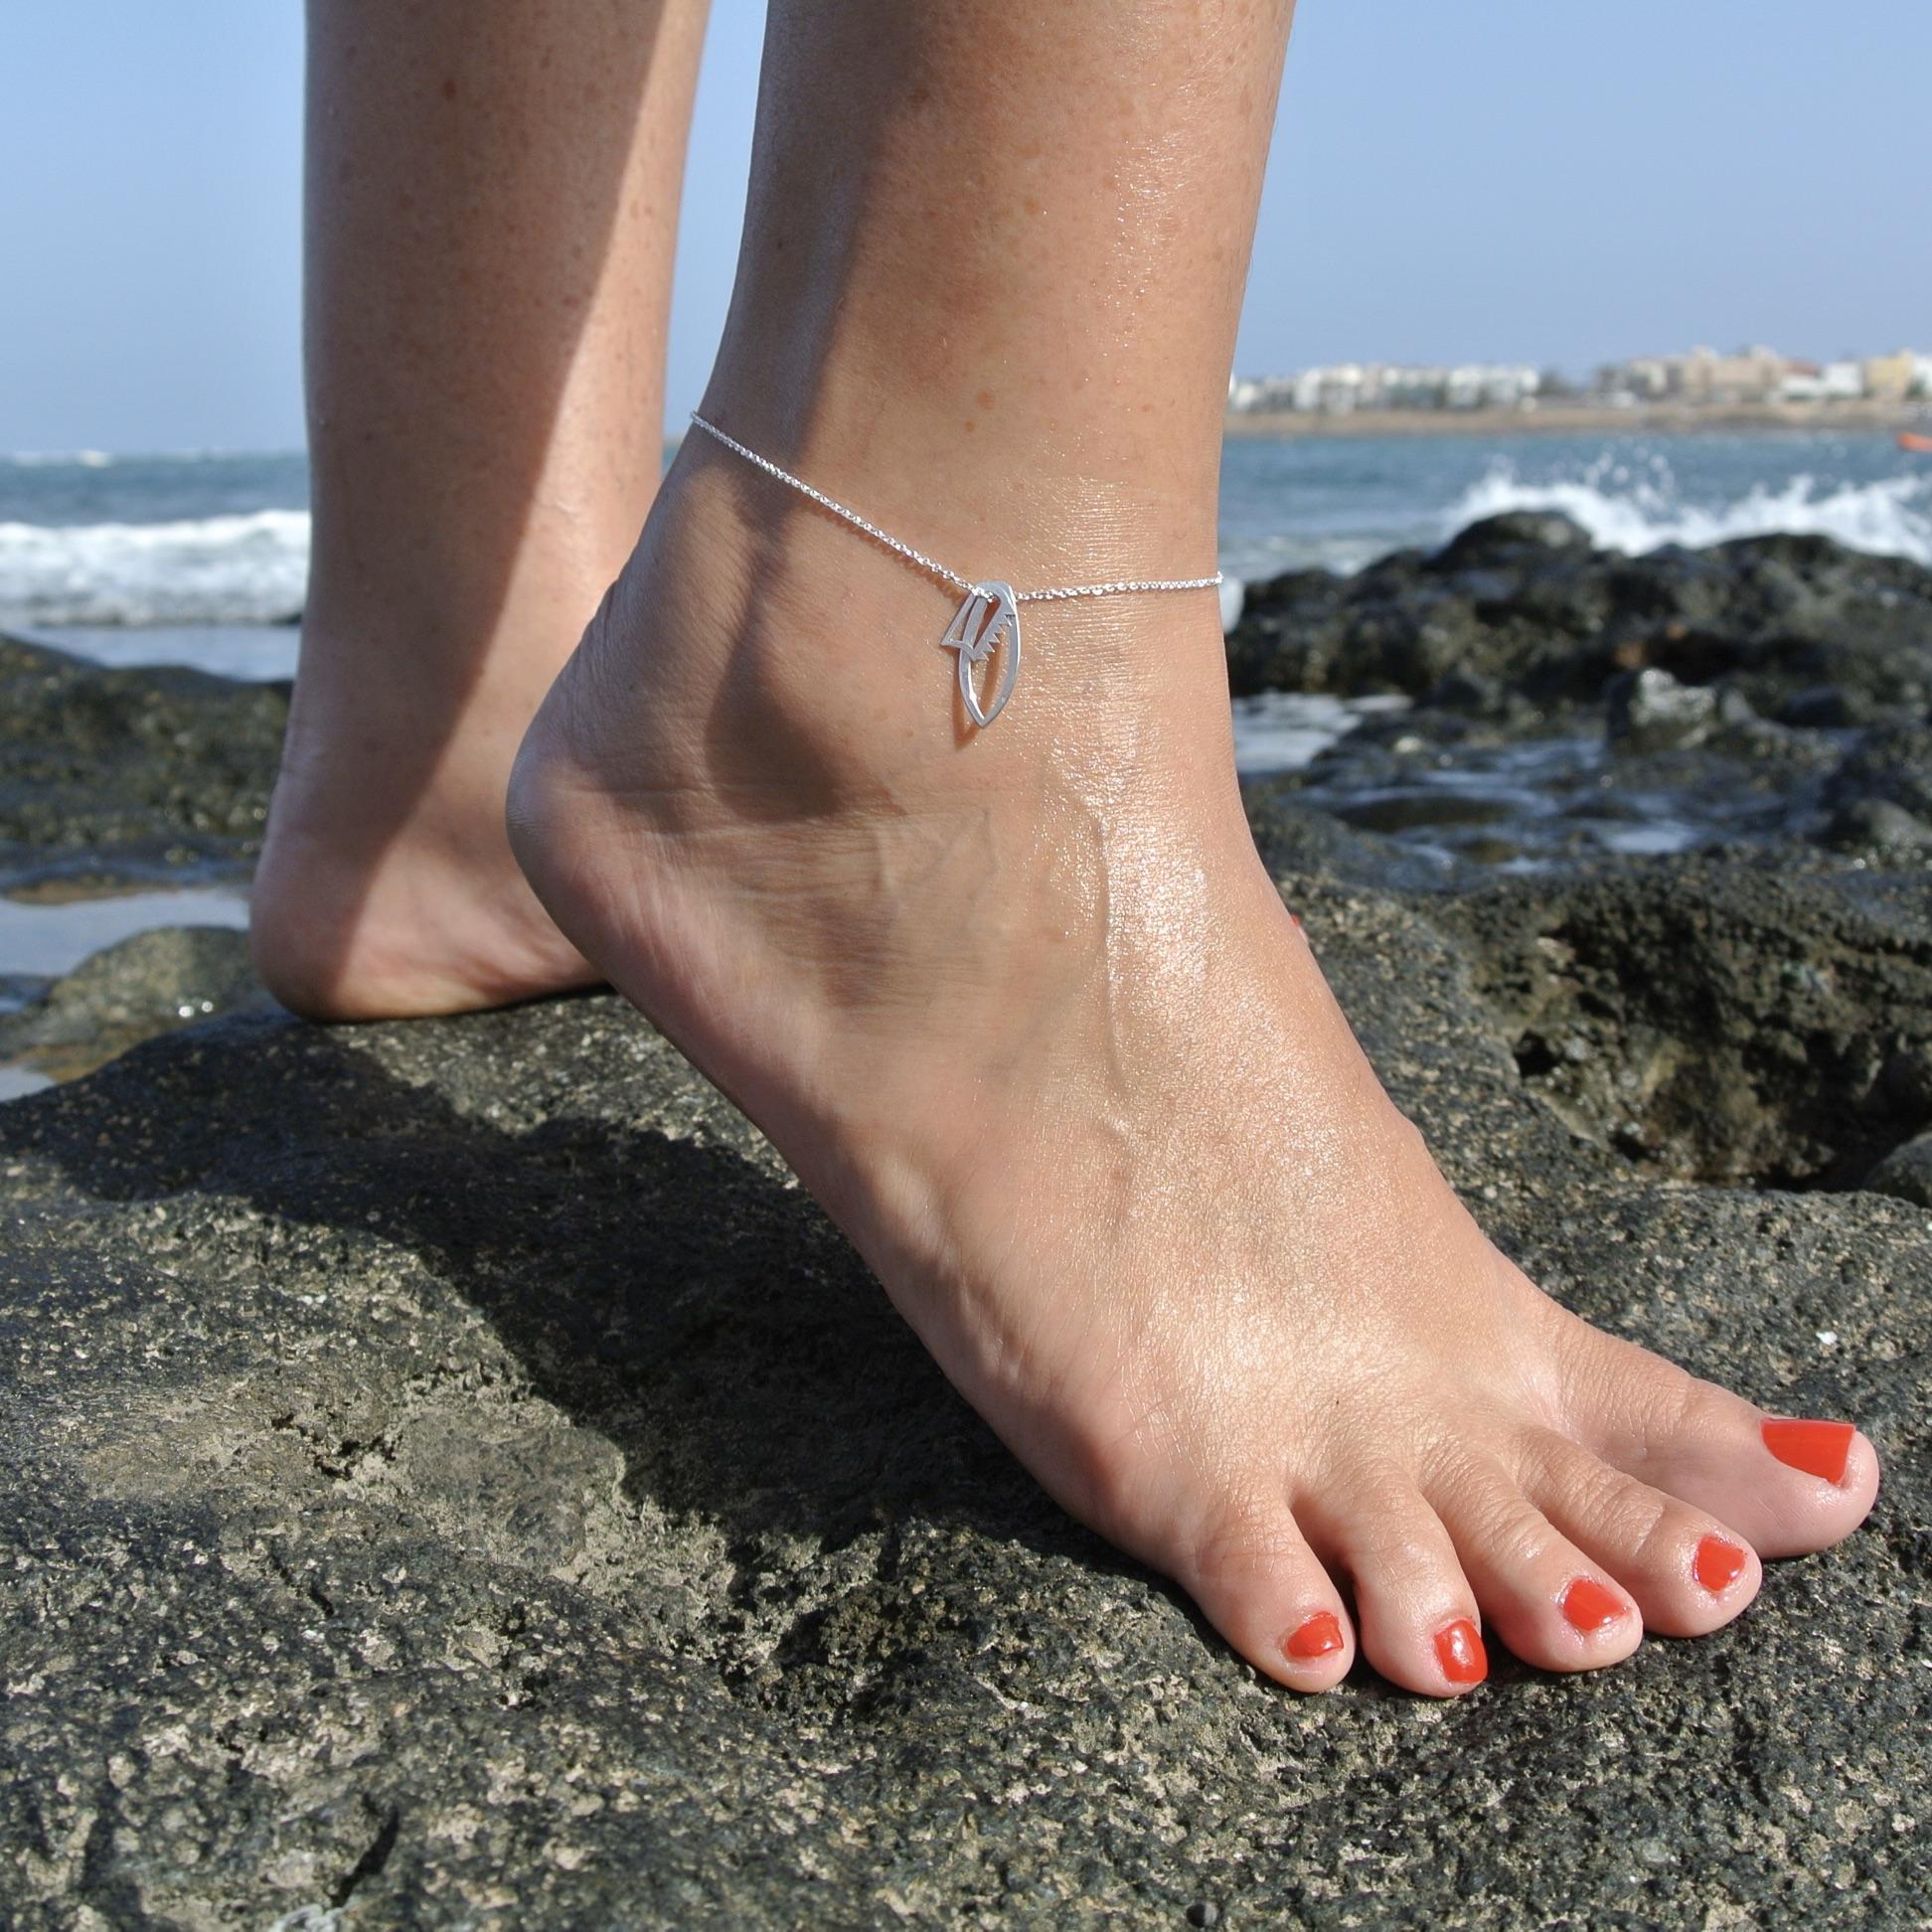 LINEAS DE SURF TOBILLERA